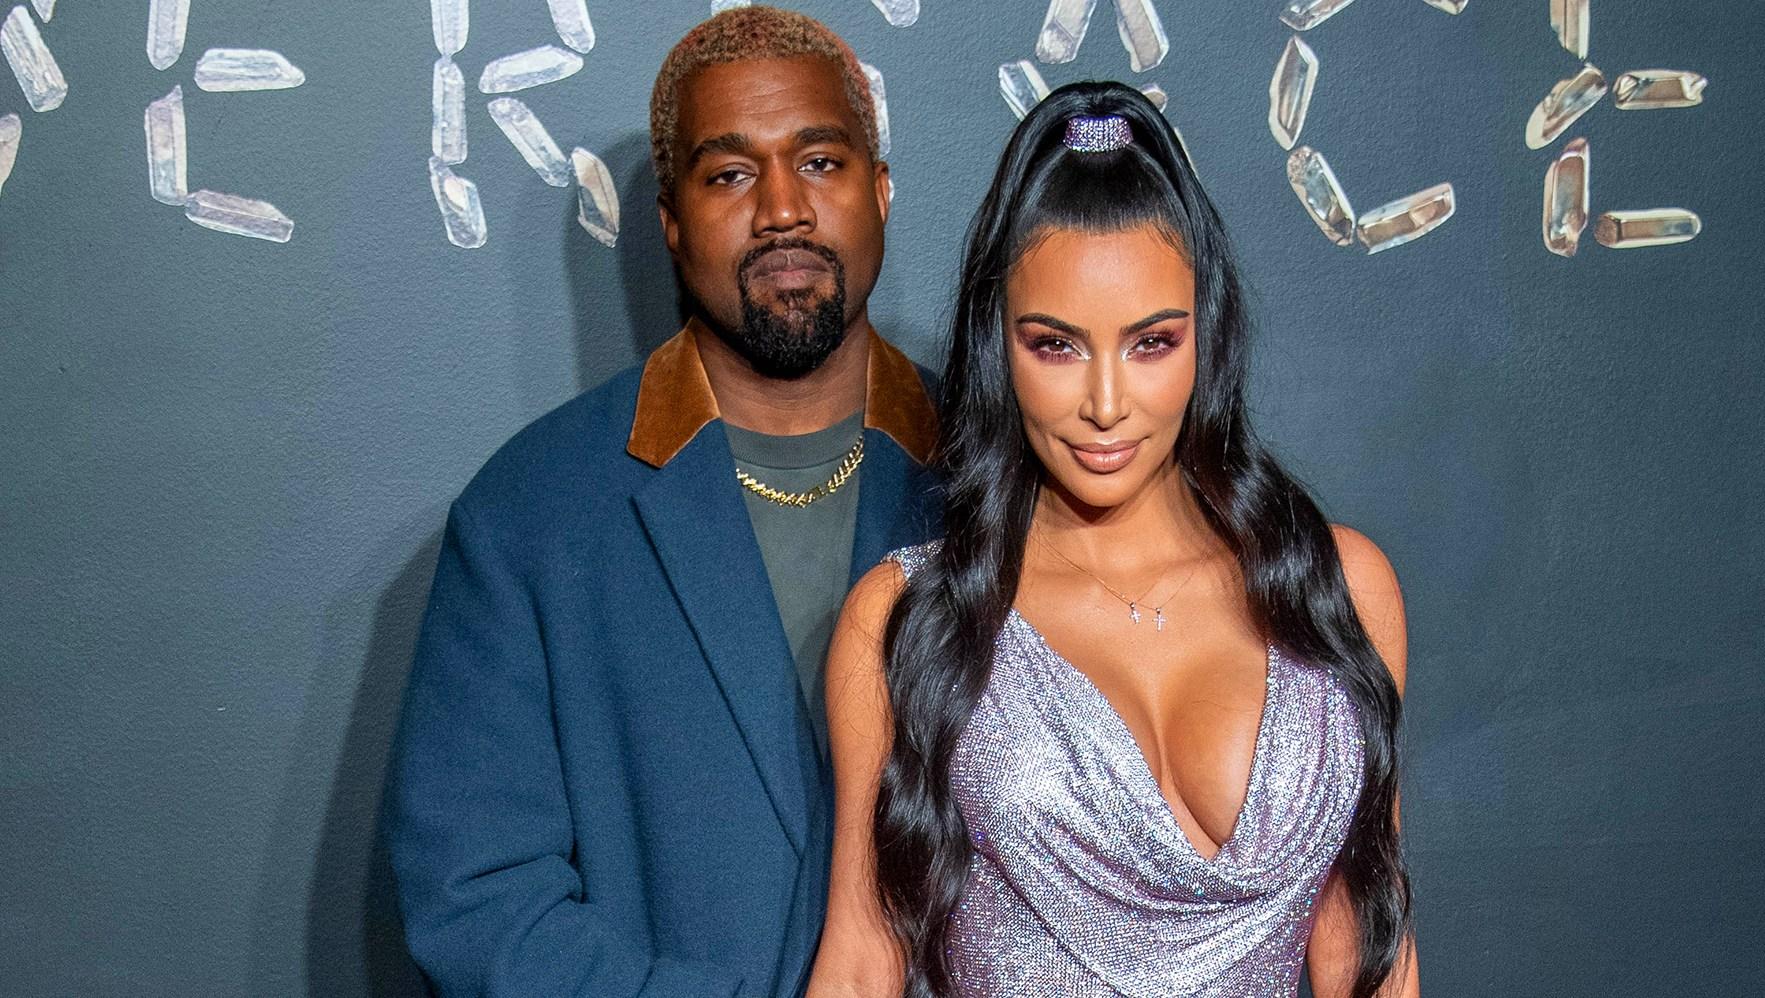 Kanye West and Kim Kardashian West surrogate